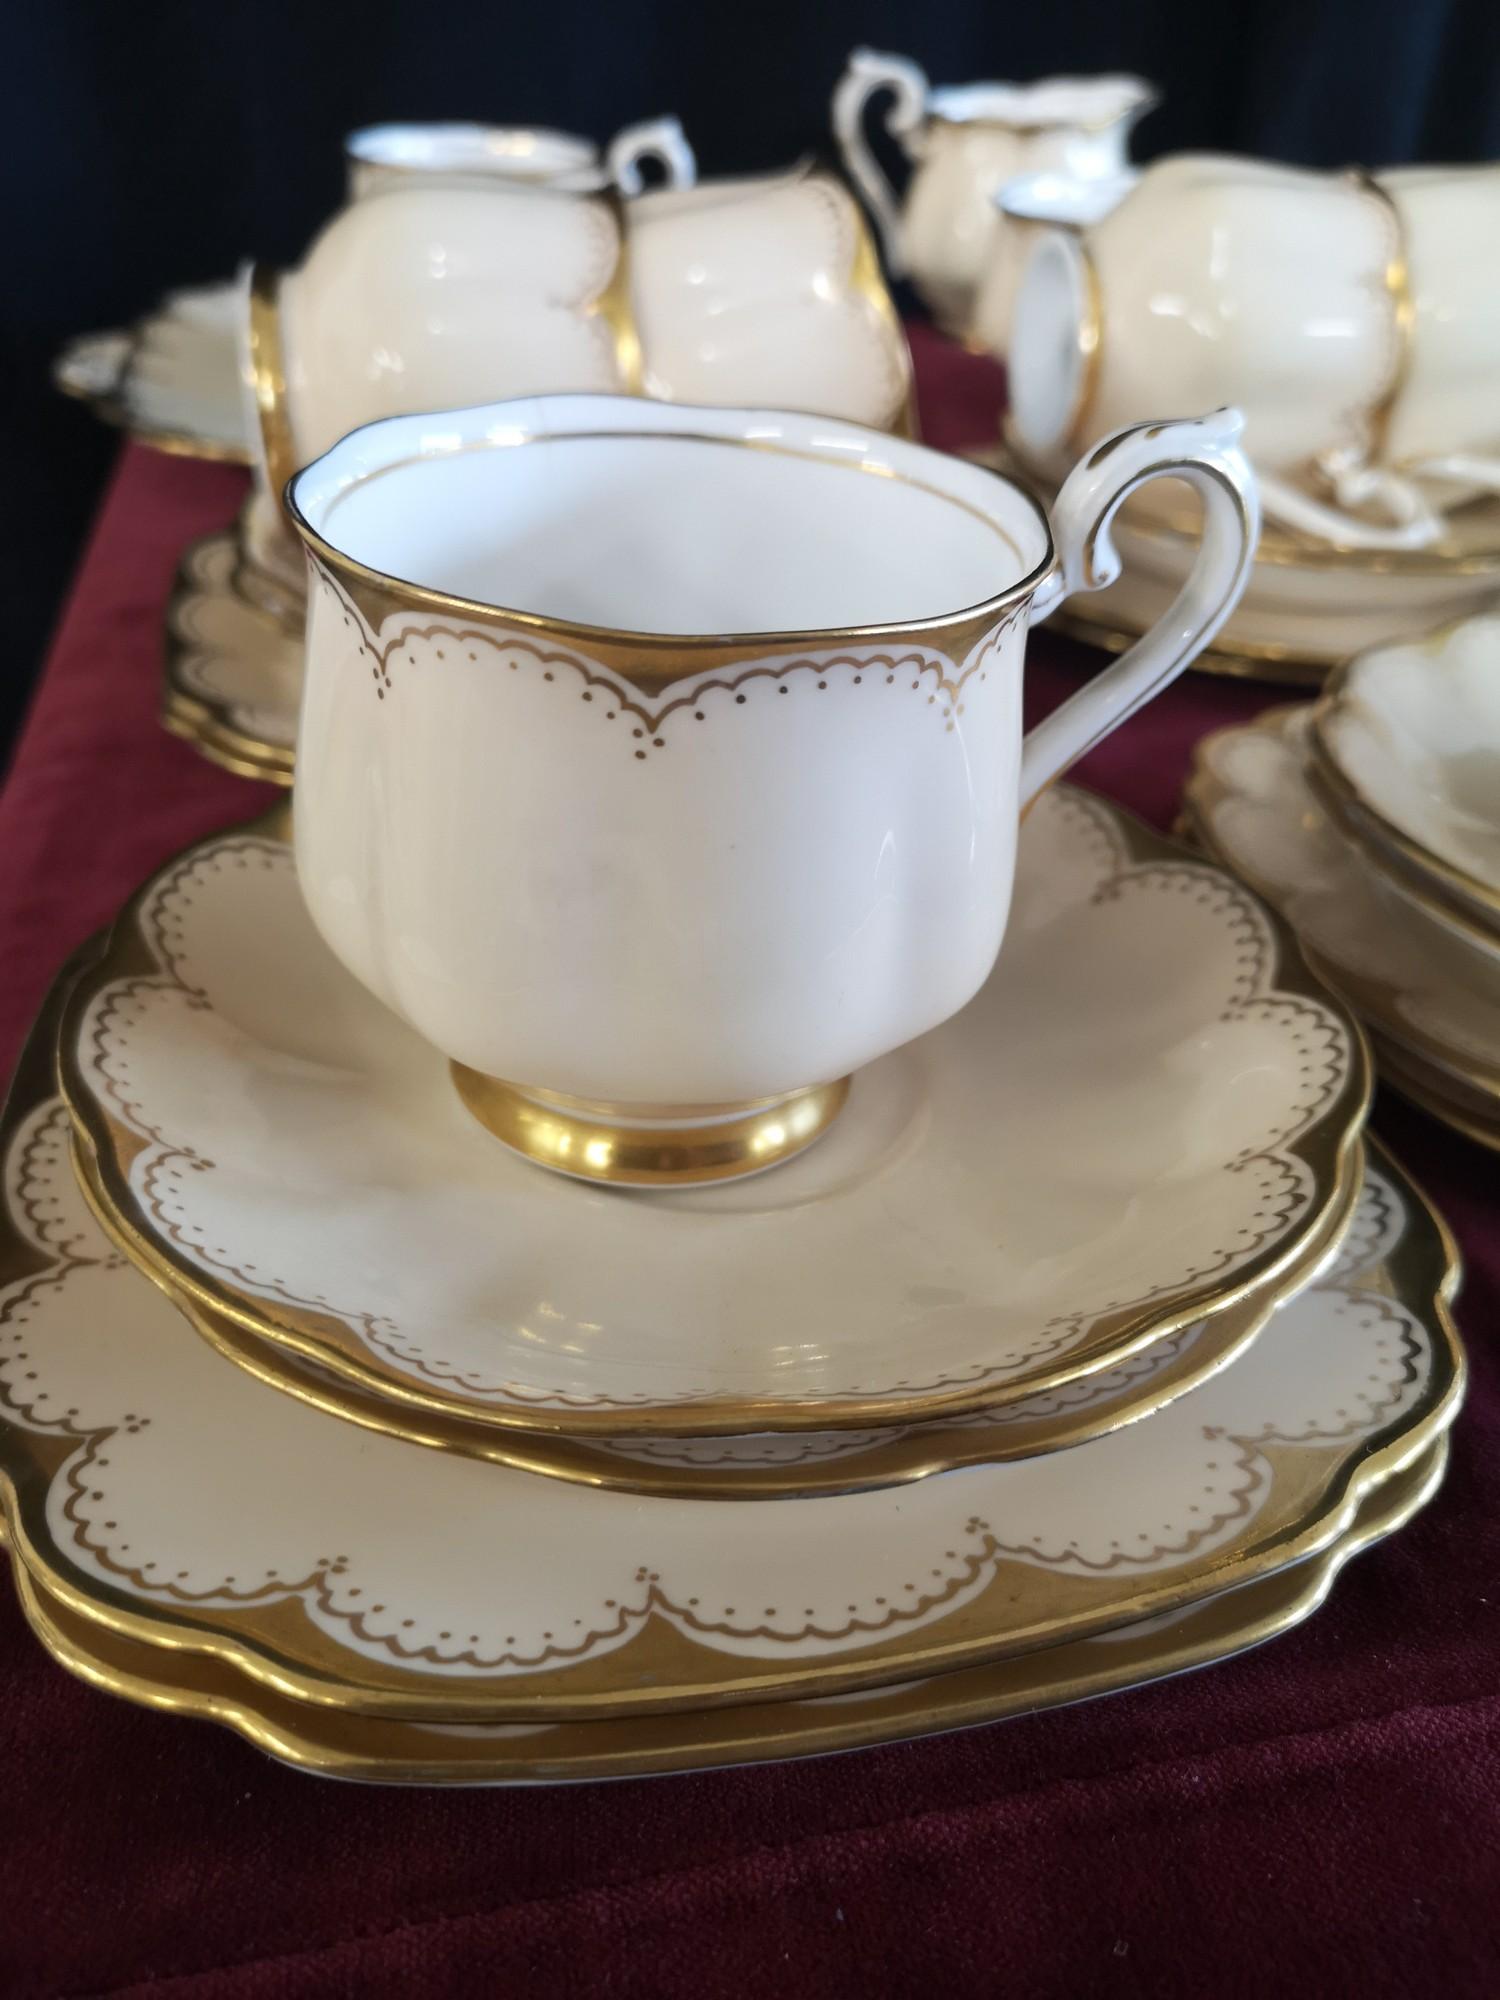 Large 1900s Royal Albert gilt tea set, set in cream back ground. - Image 10 of 10